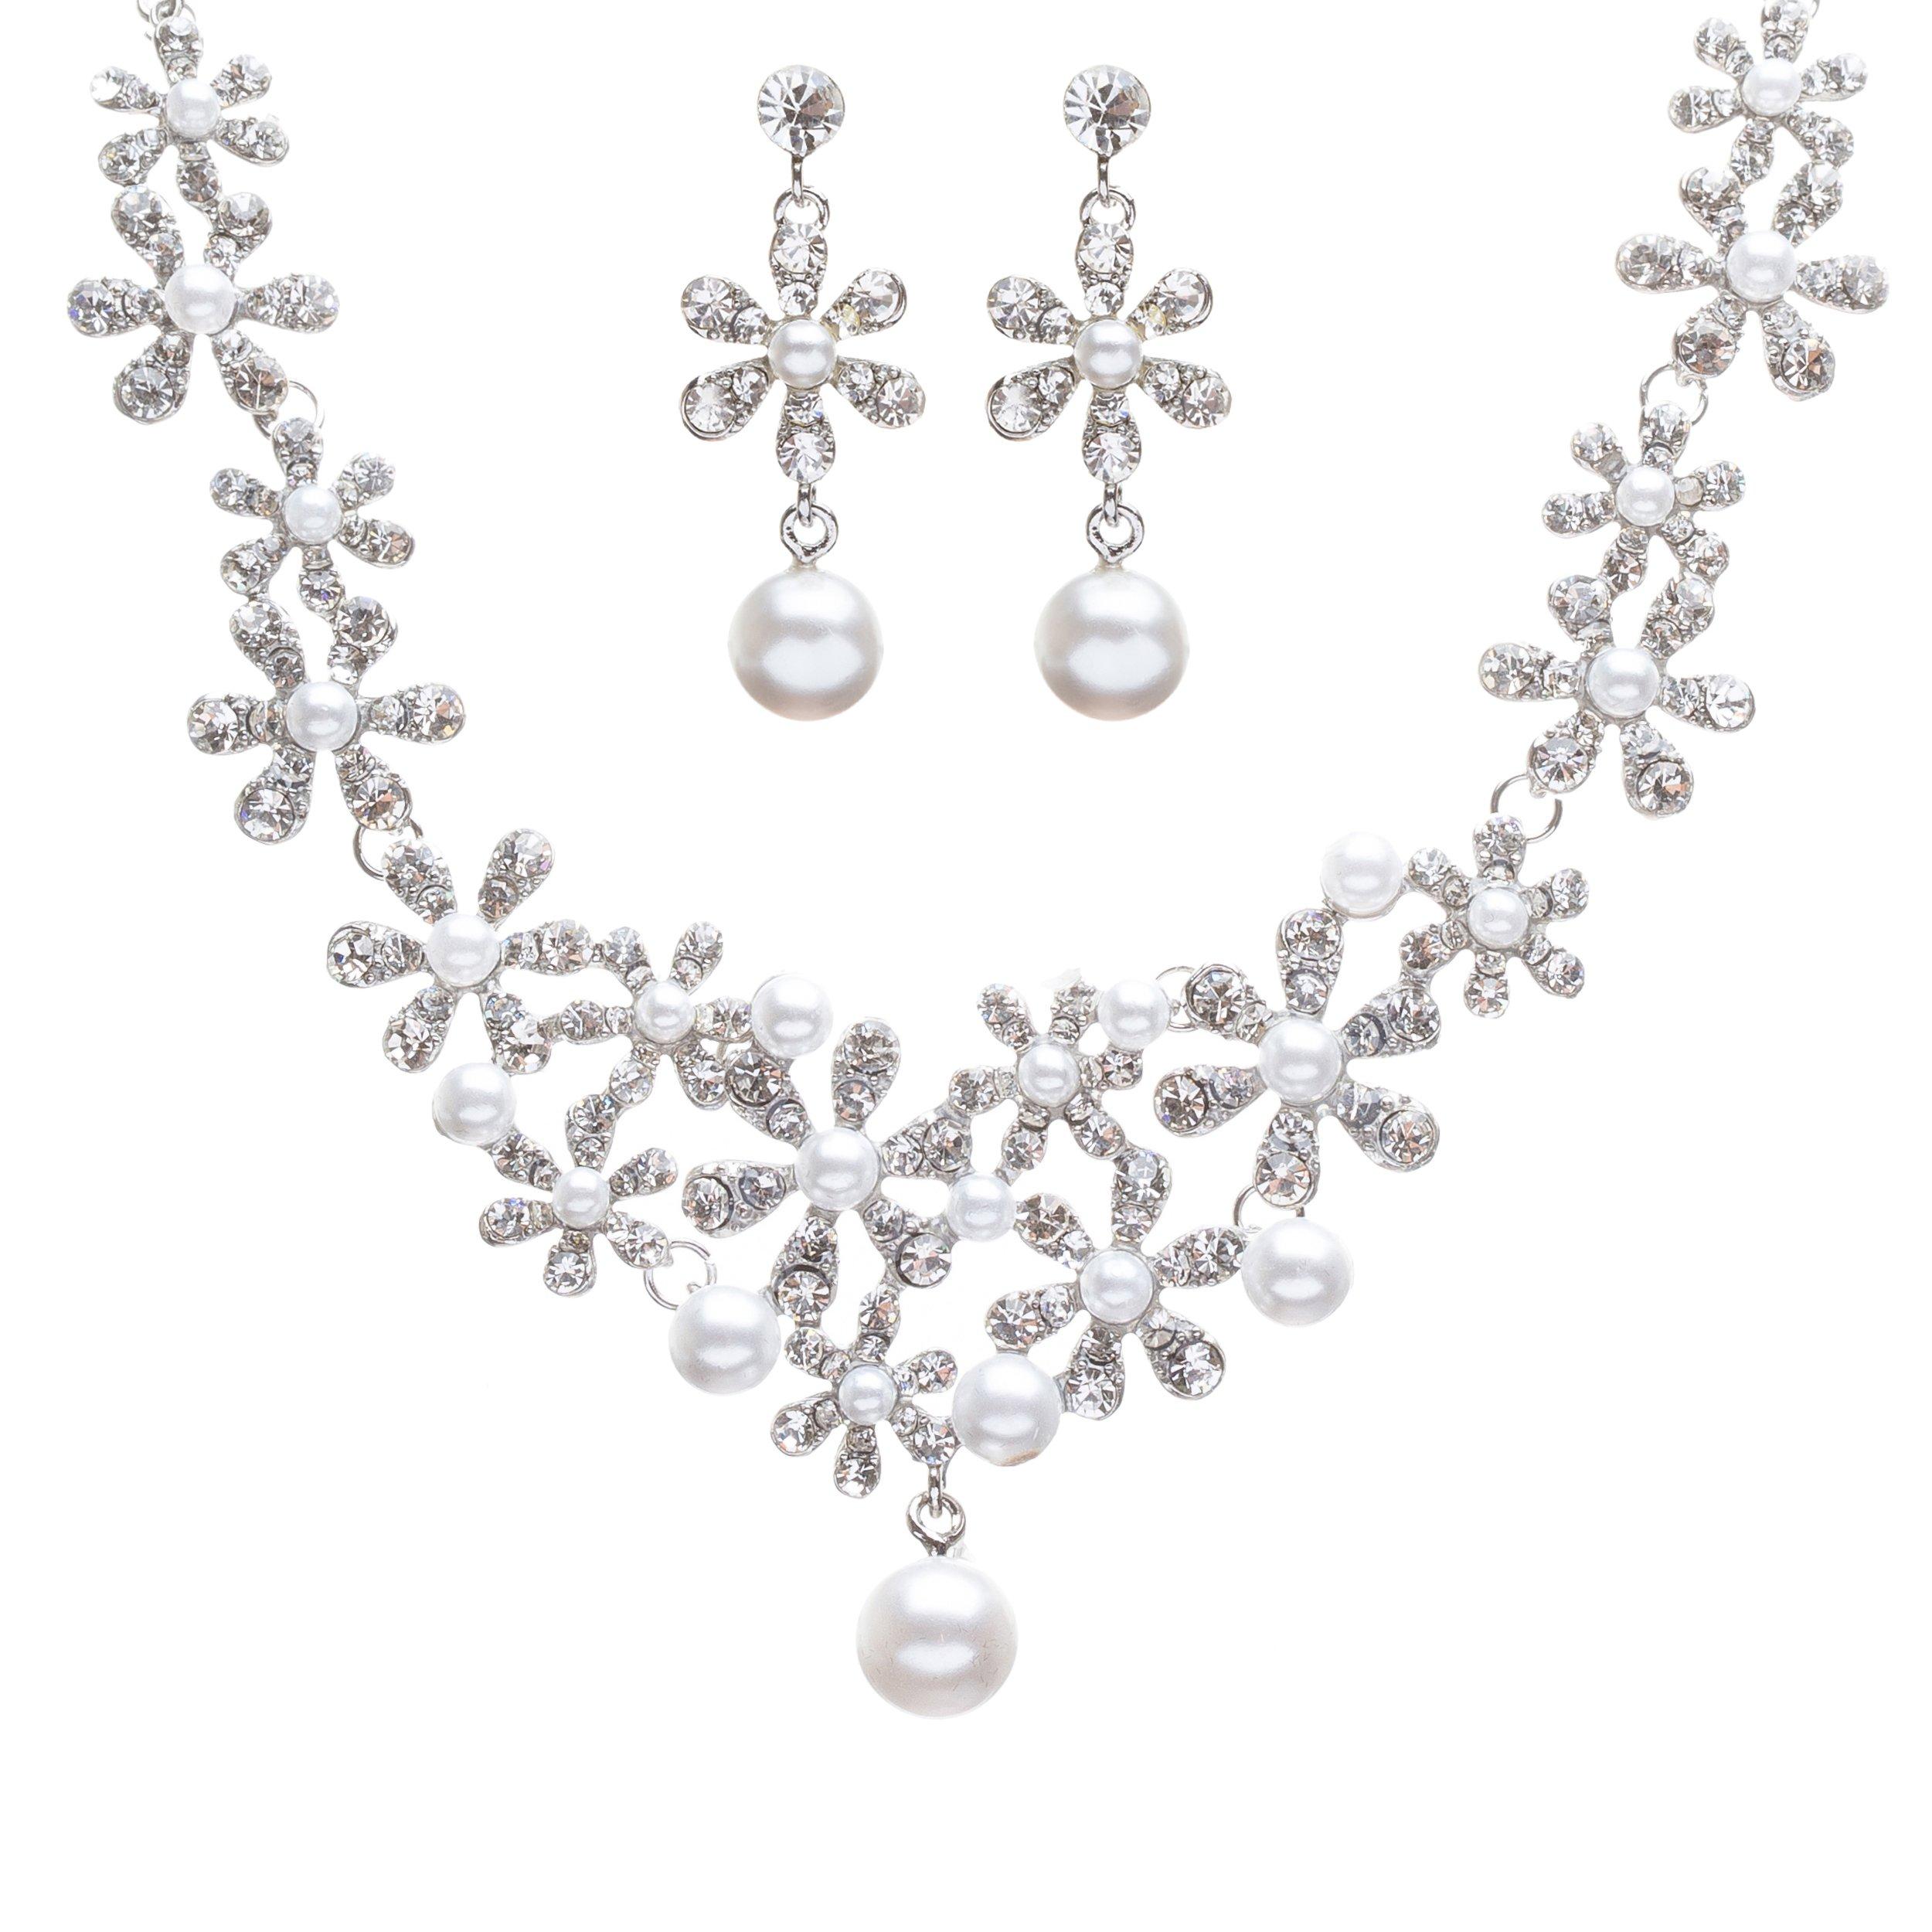 ACCESSORIESFOREVER Women Bridal Wedding Prom Fashion Jewelry Set Crystal Rhinestone Pearl Gorgeous Daisy Necklace SV